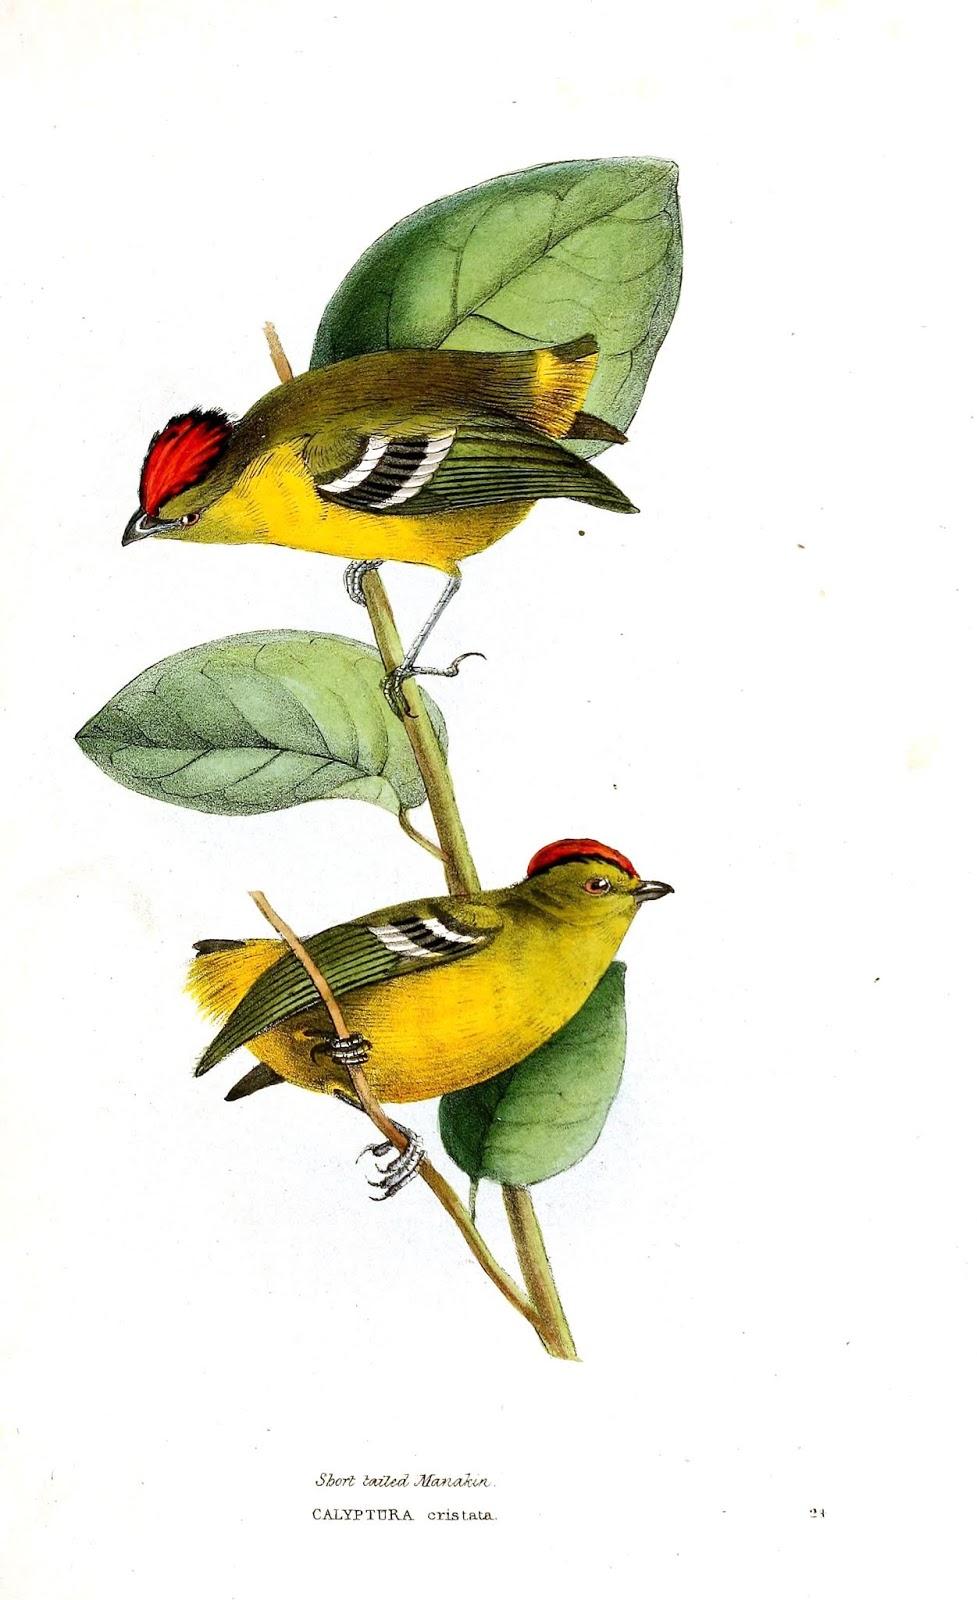 Pássaros em Imagens Vintage